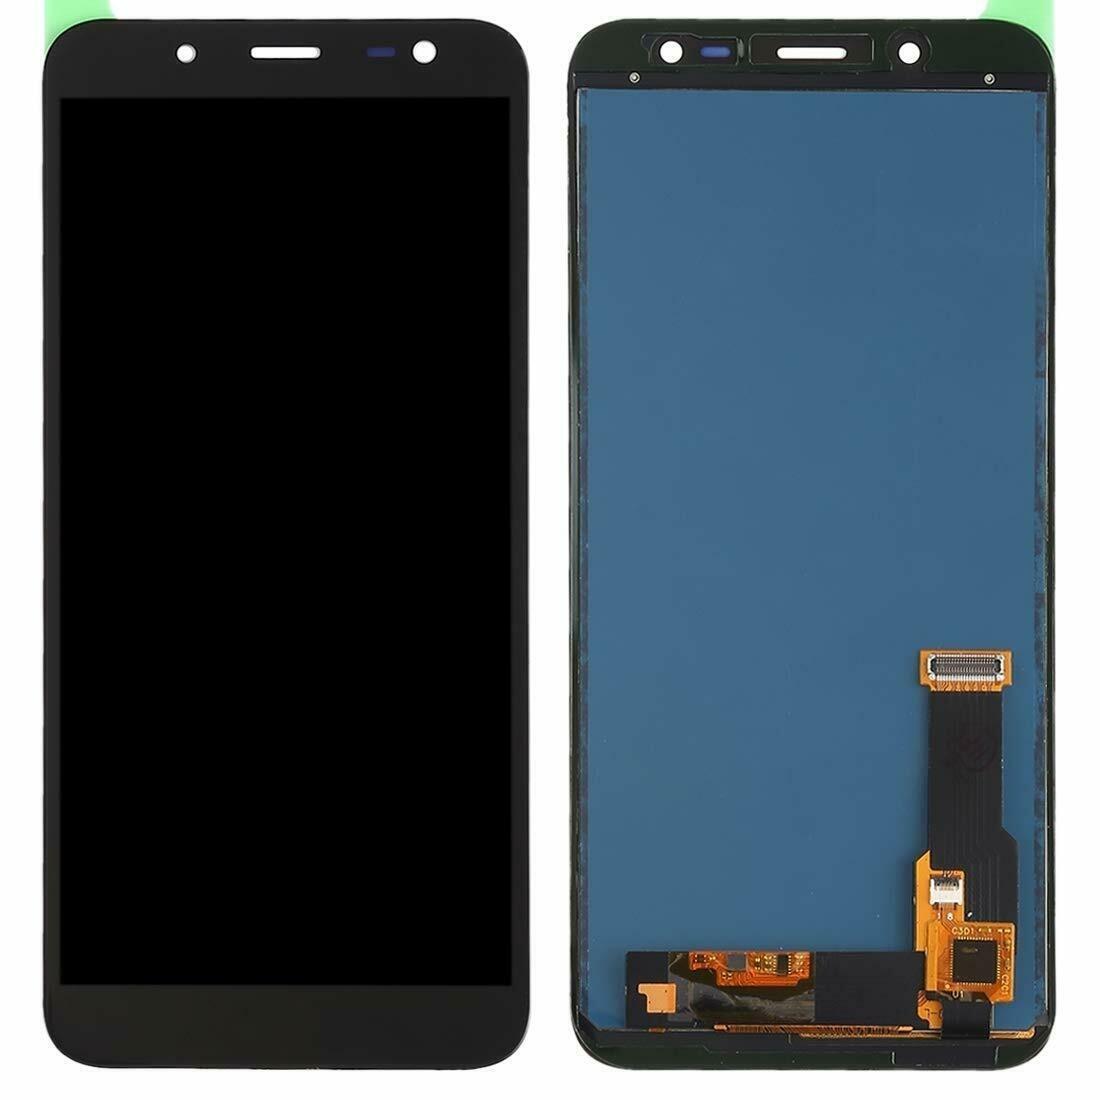 modulo-oled-samsung-j6-2018-j600-pantalla-display-D_NQ_NP_684783-MLA31113568816_062019-F.jpg